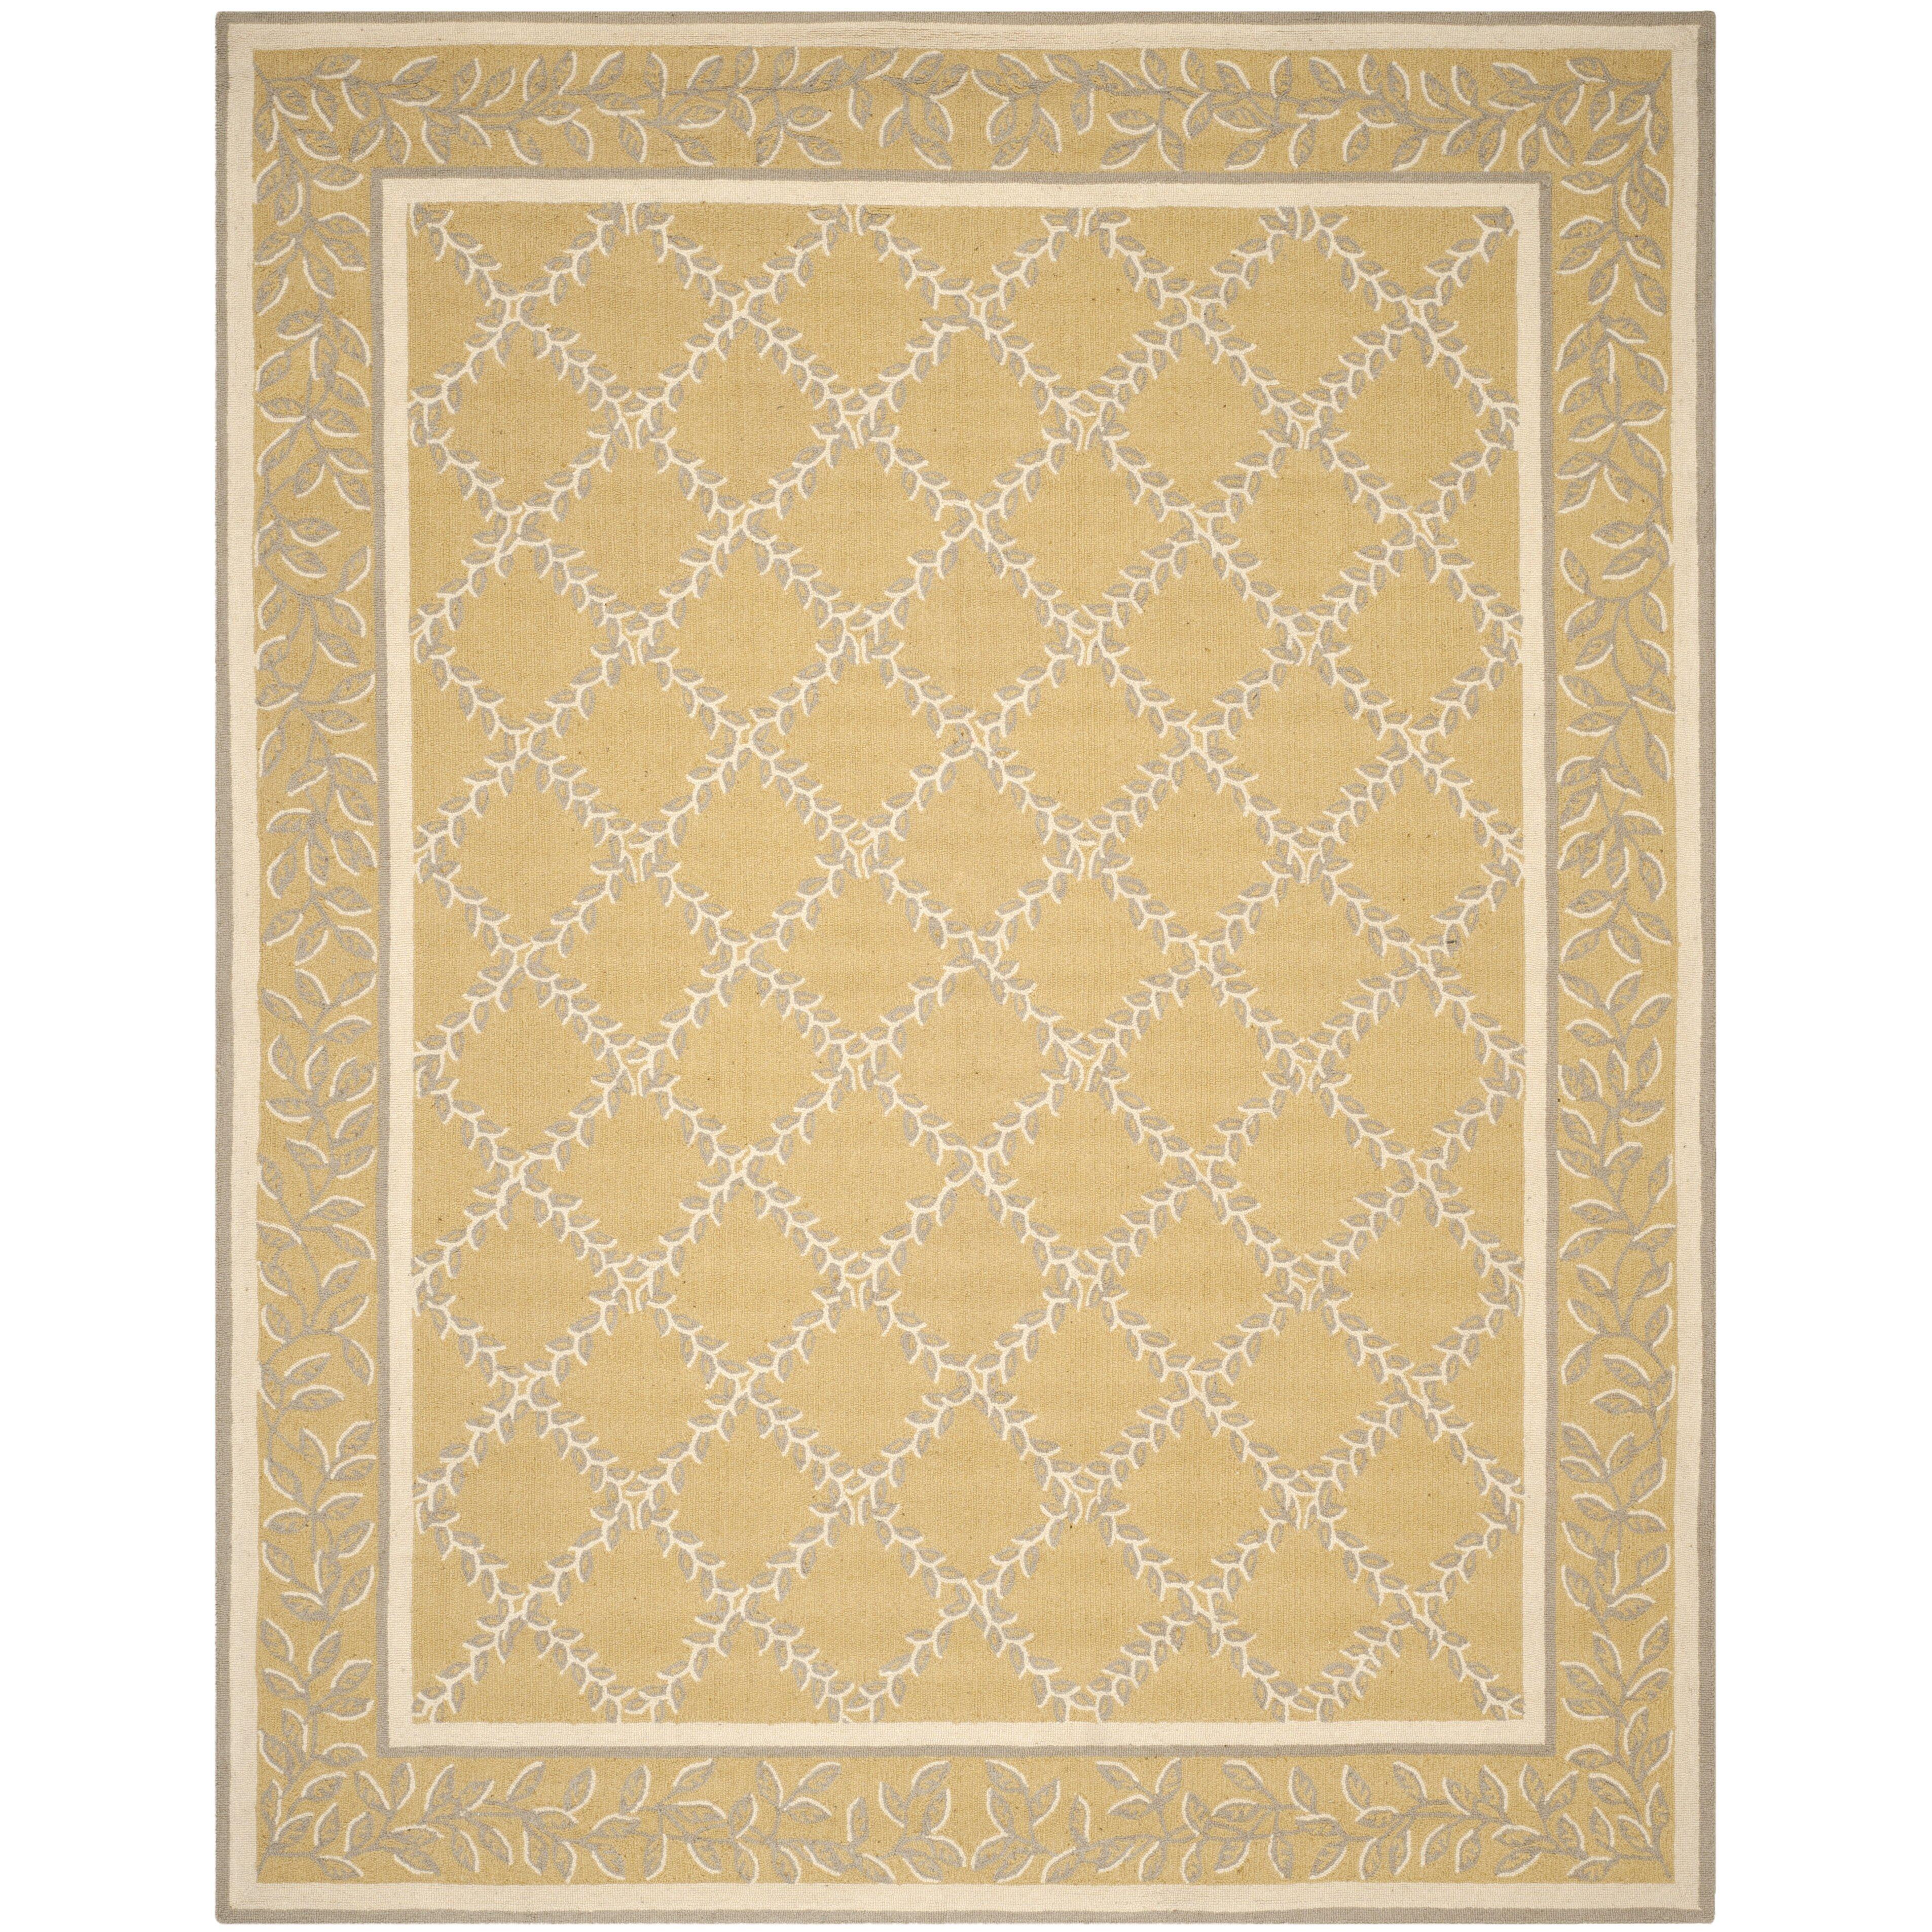 safavieh chelsea yellow grey area rug reviews wayfair. Black Bedroom Furniture Sets. Home Design Ideas